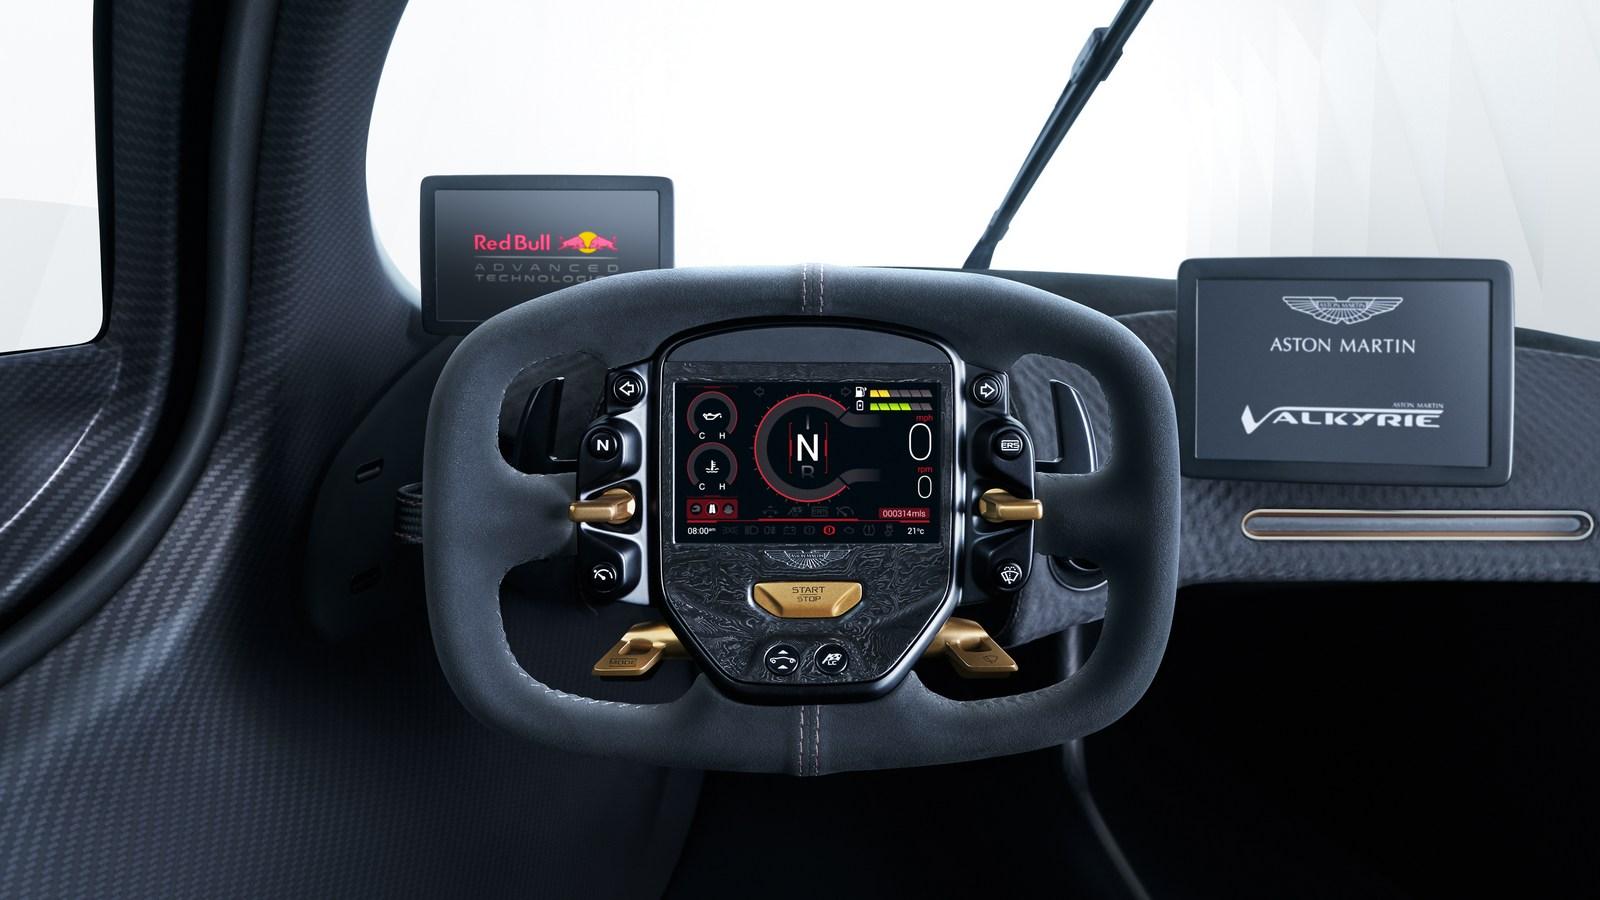 F1 2017 Car Wallpaper Aston Martin Valkyrie Amr Pro Is A Roaring V12 Powered